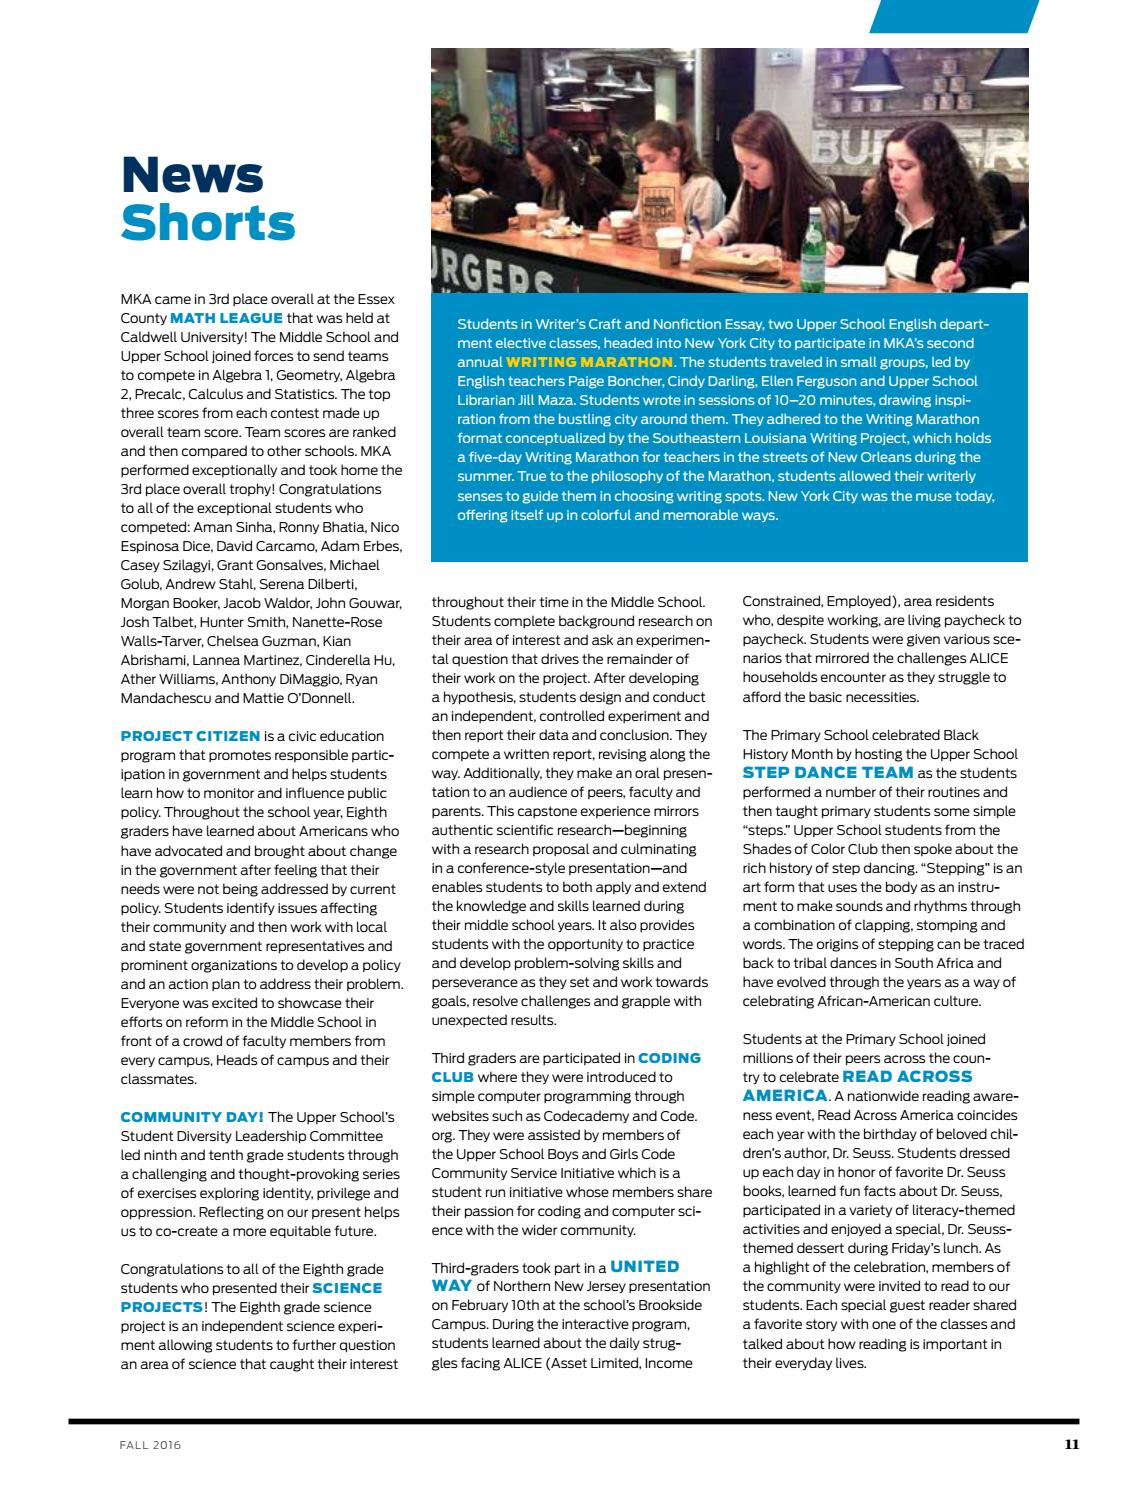 Fall 2016 Review Magazine by Montclair Kimberley Academy - issuu